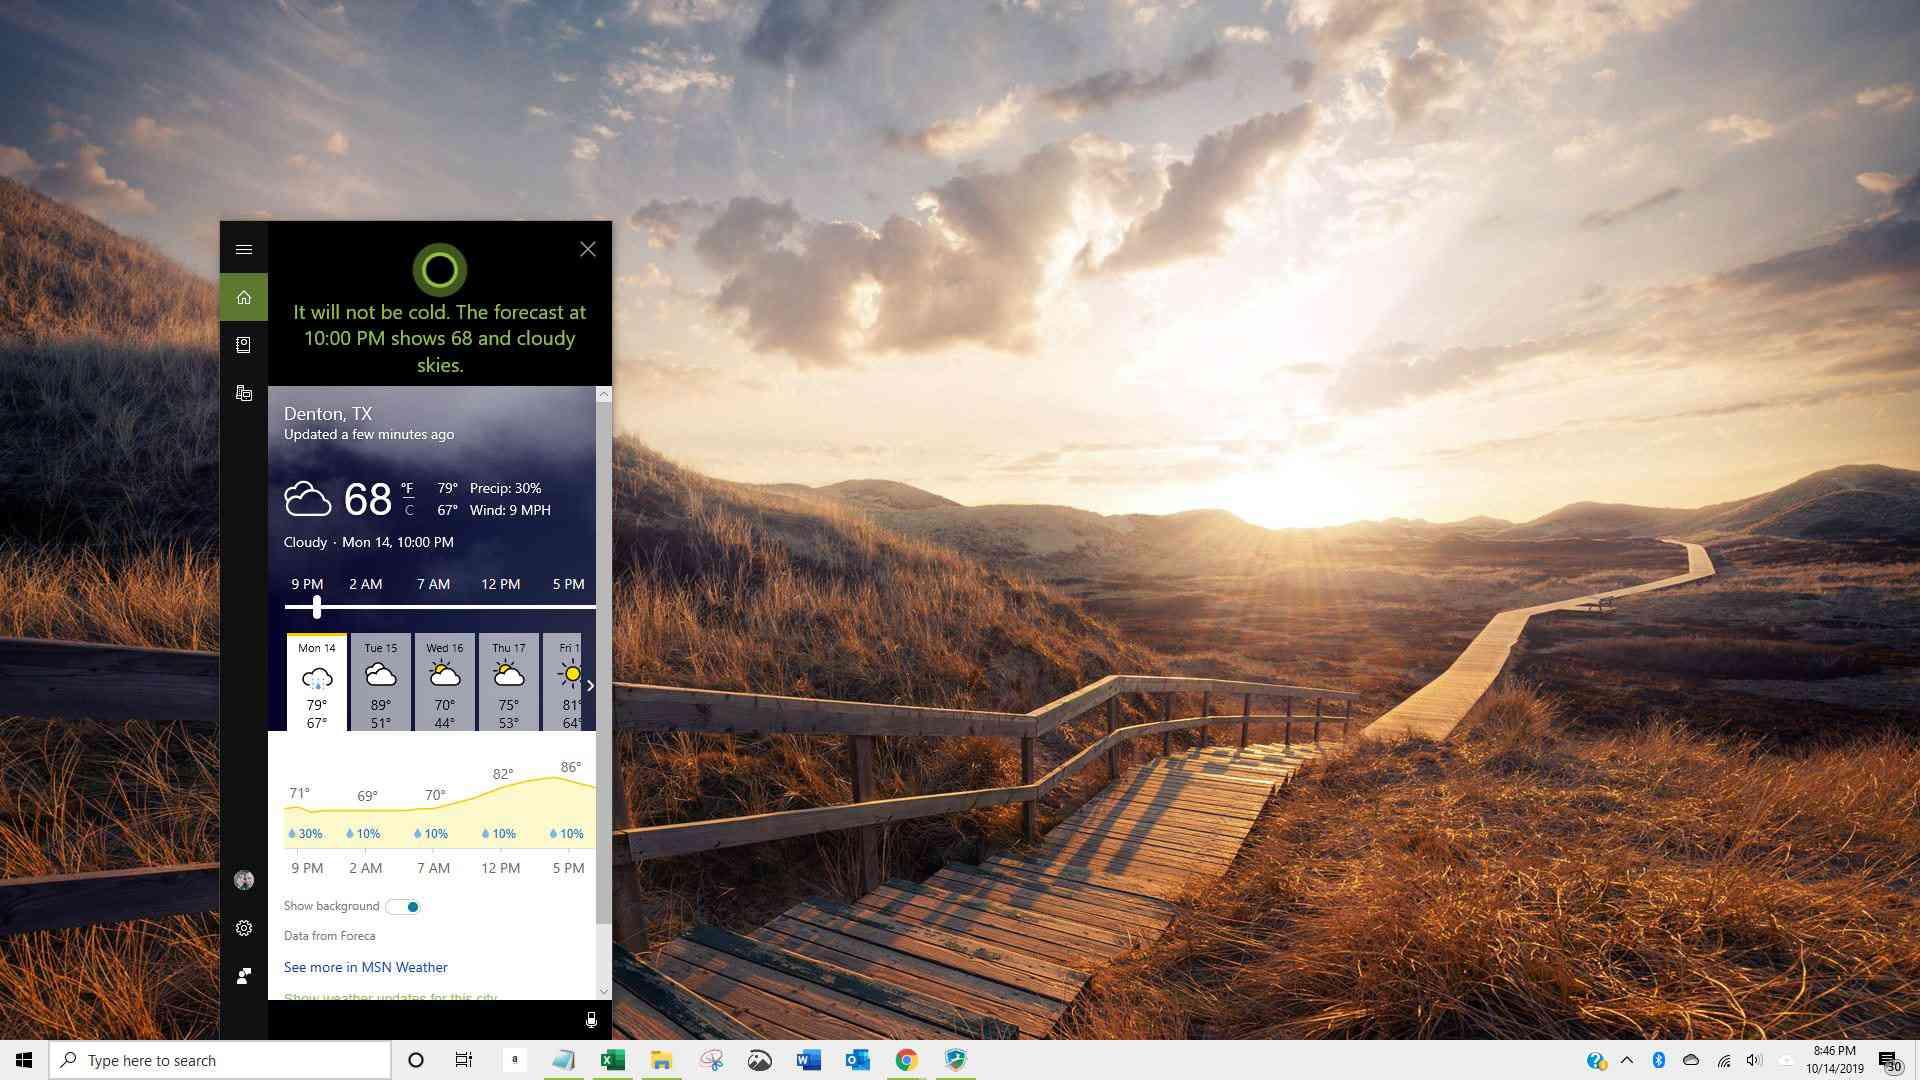 Screenshot of Cortana answering